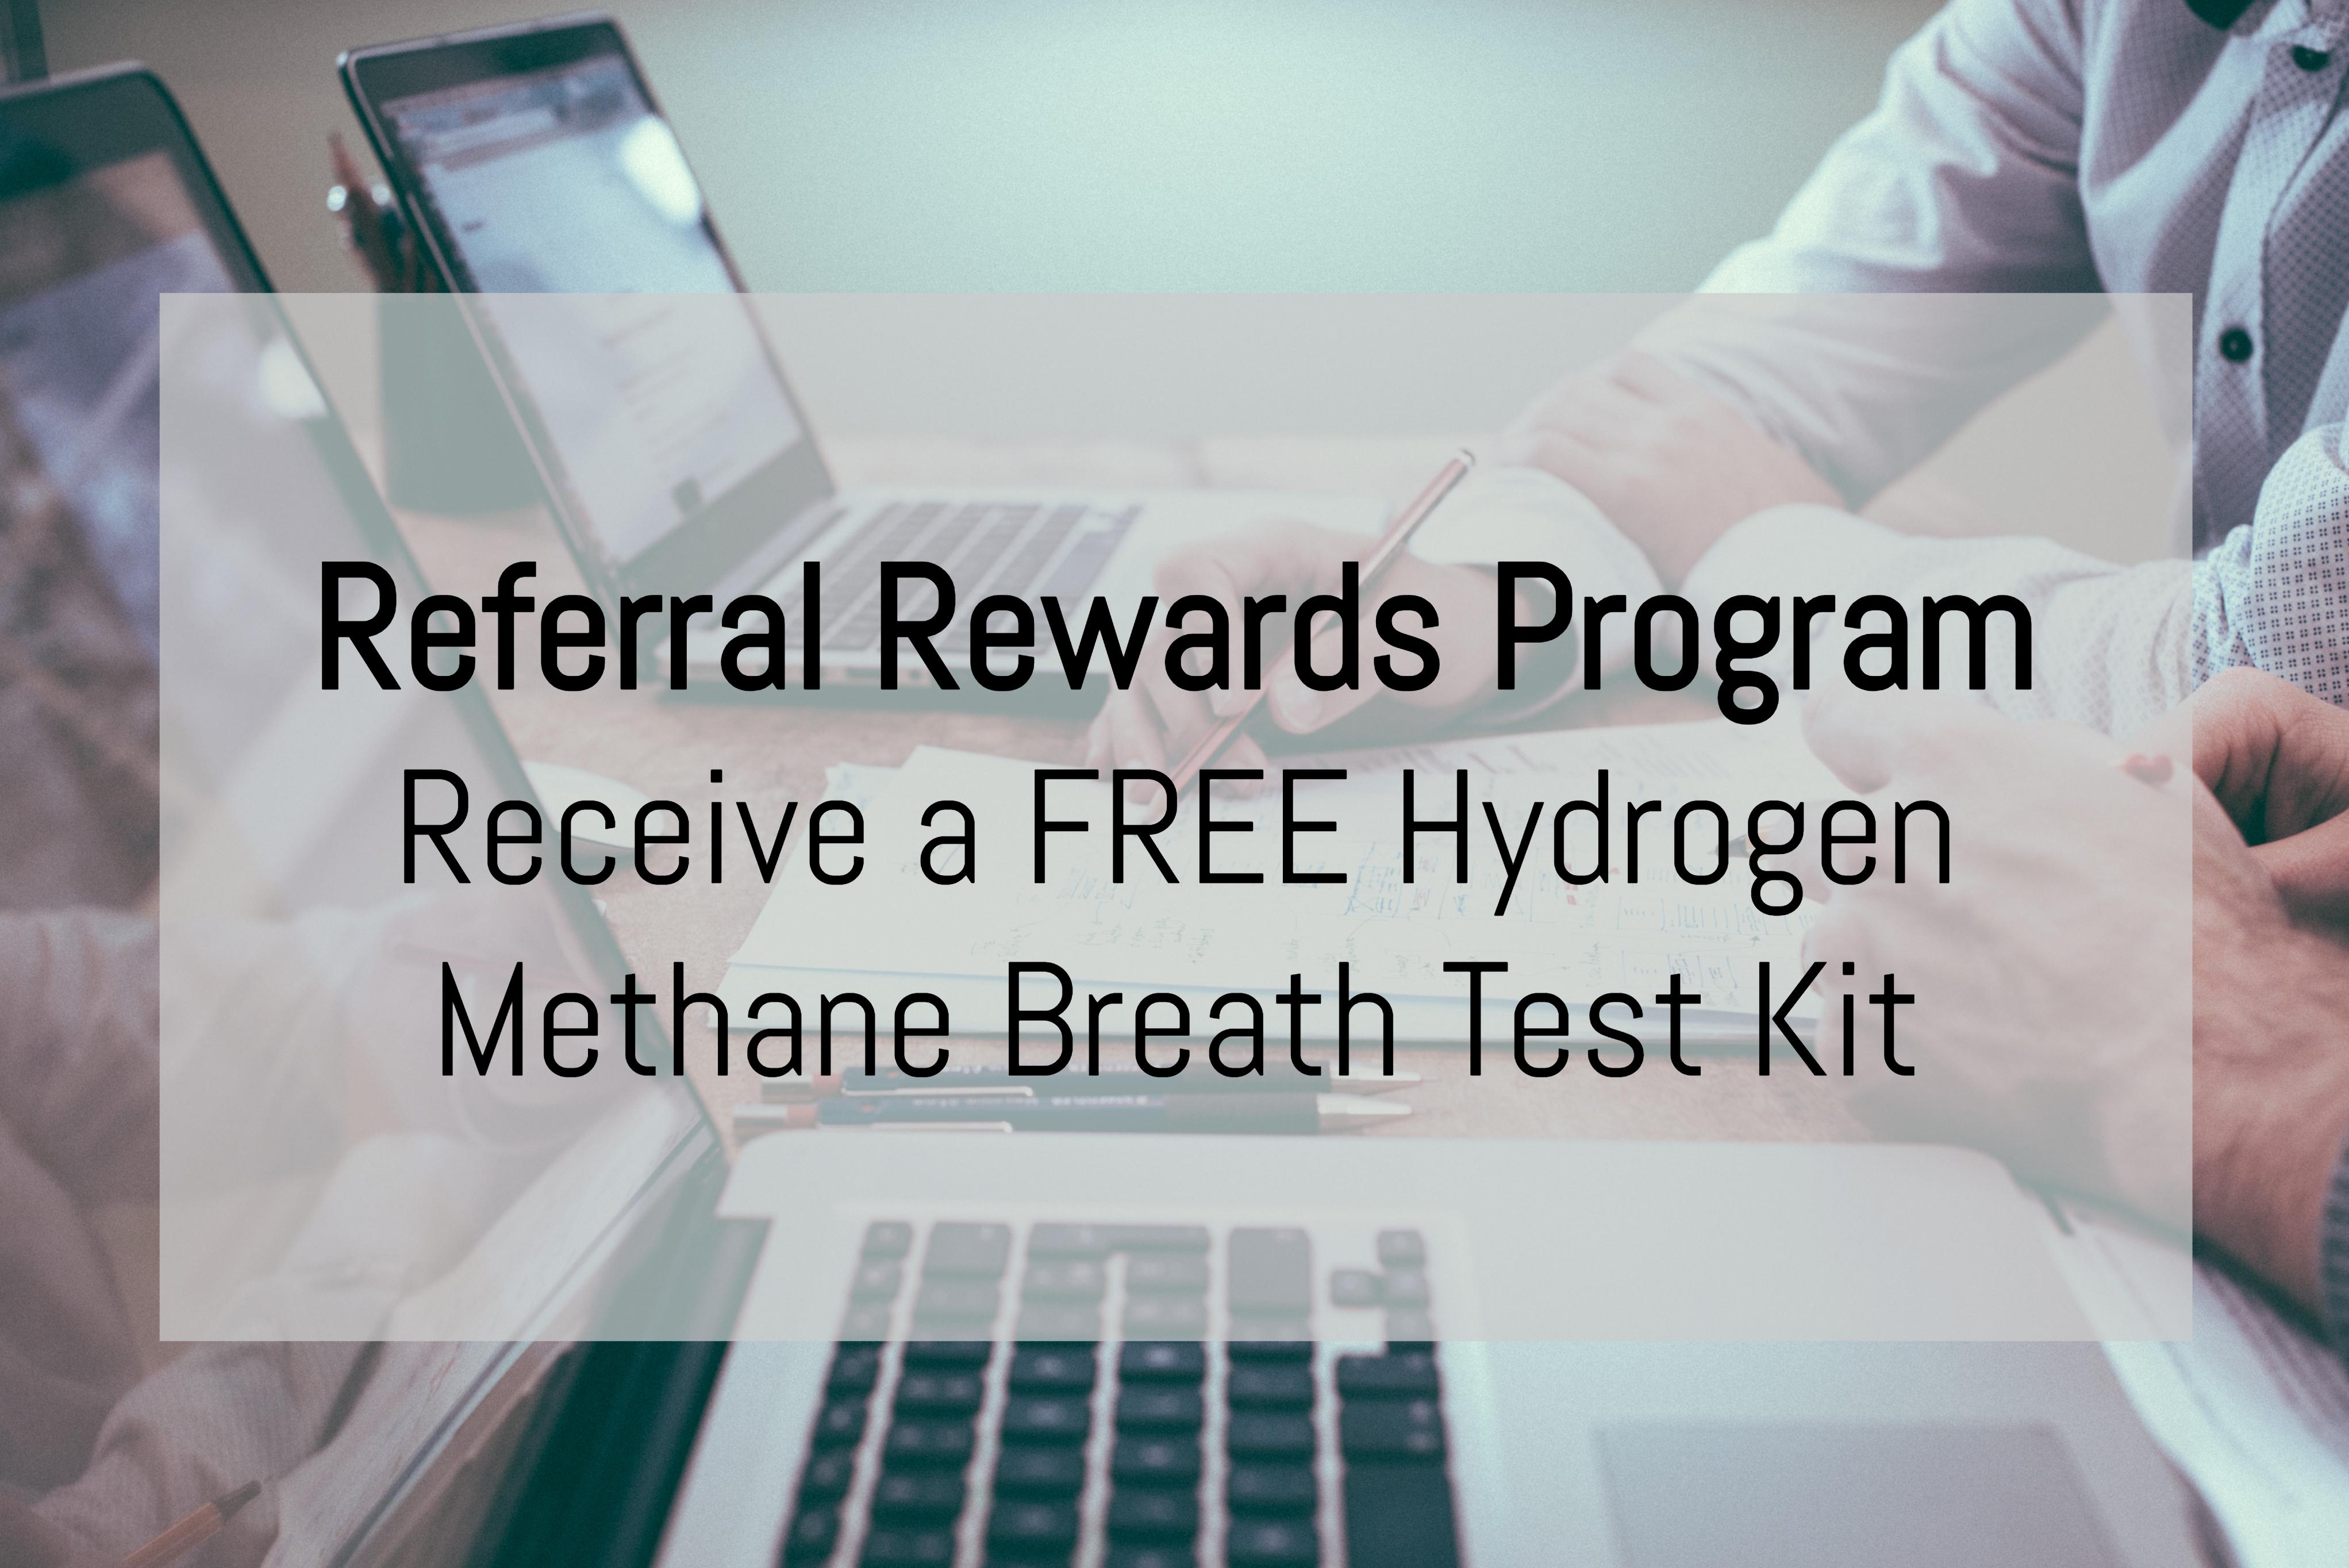 Referral Rewards Program